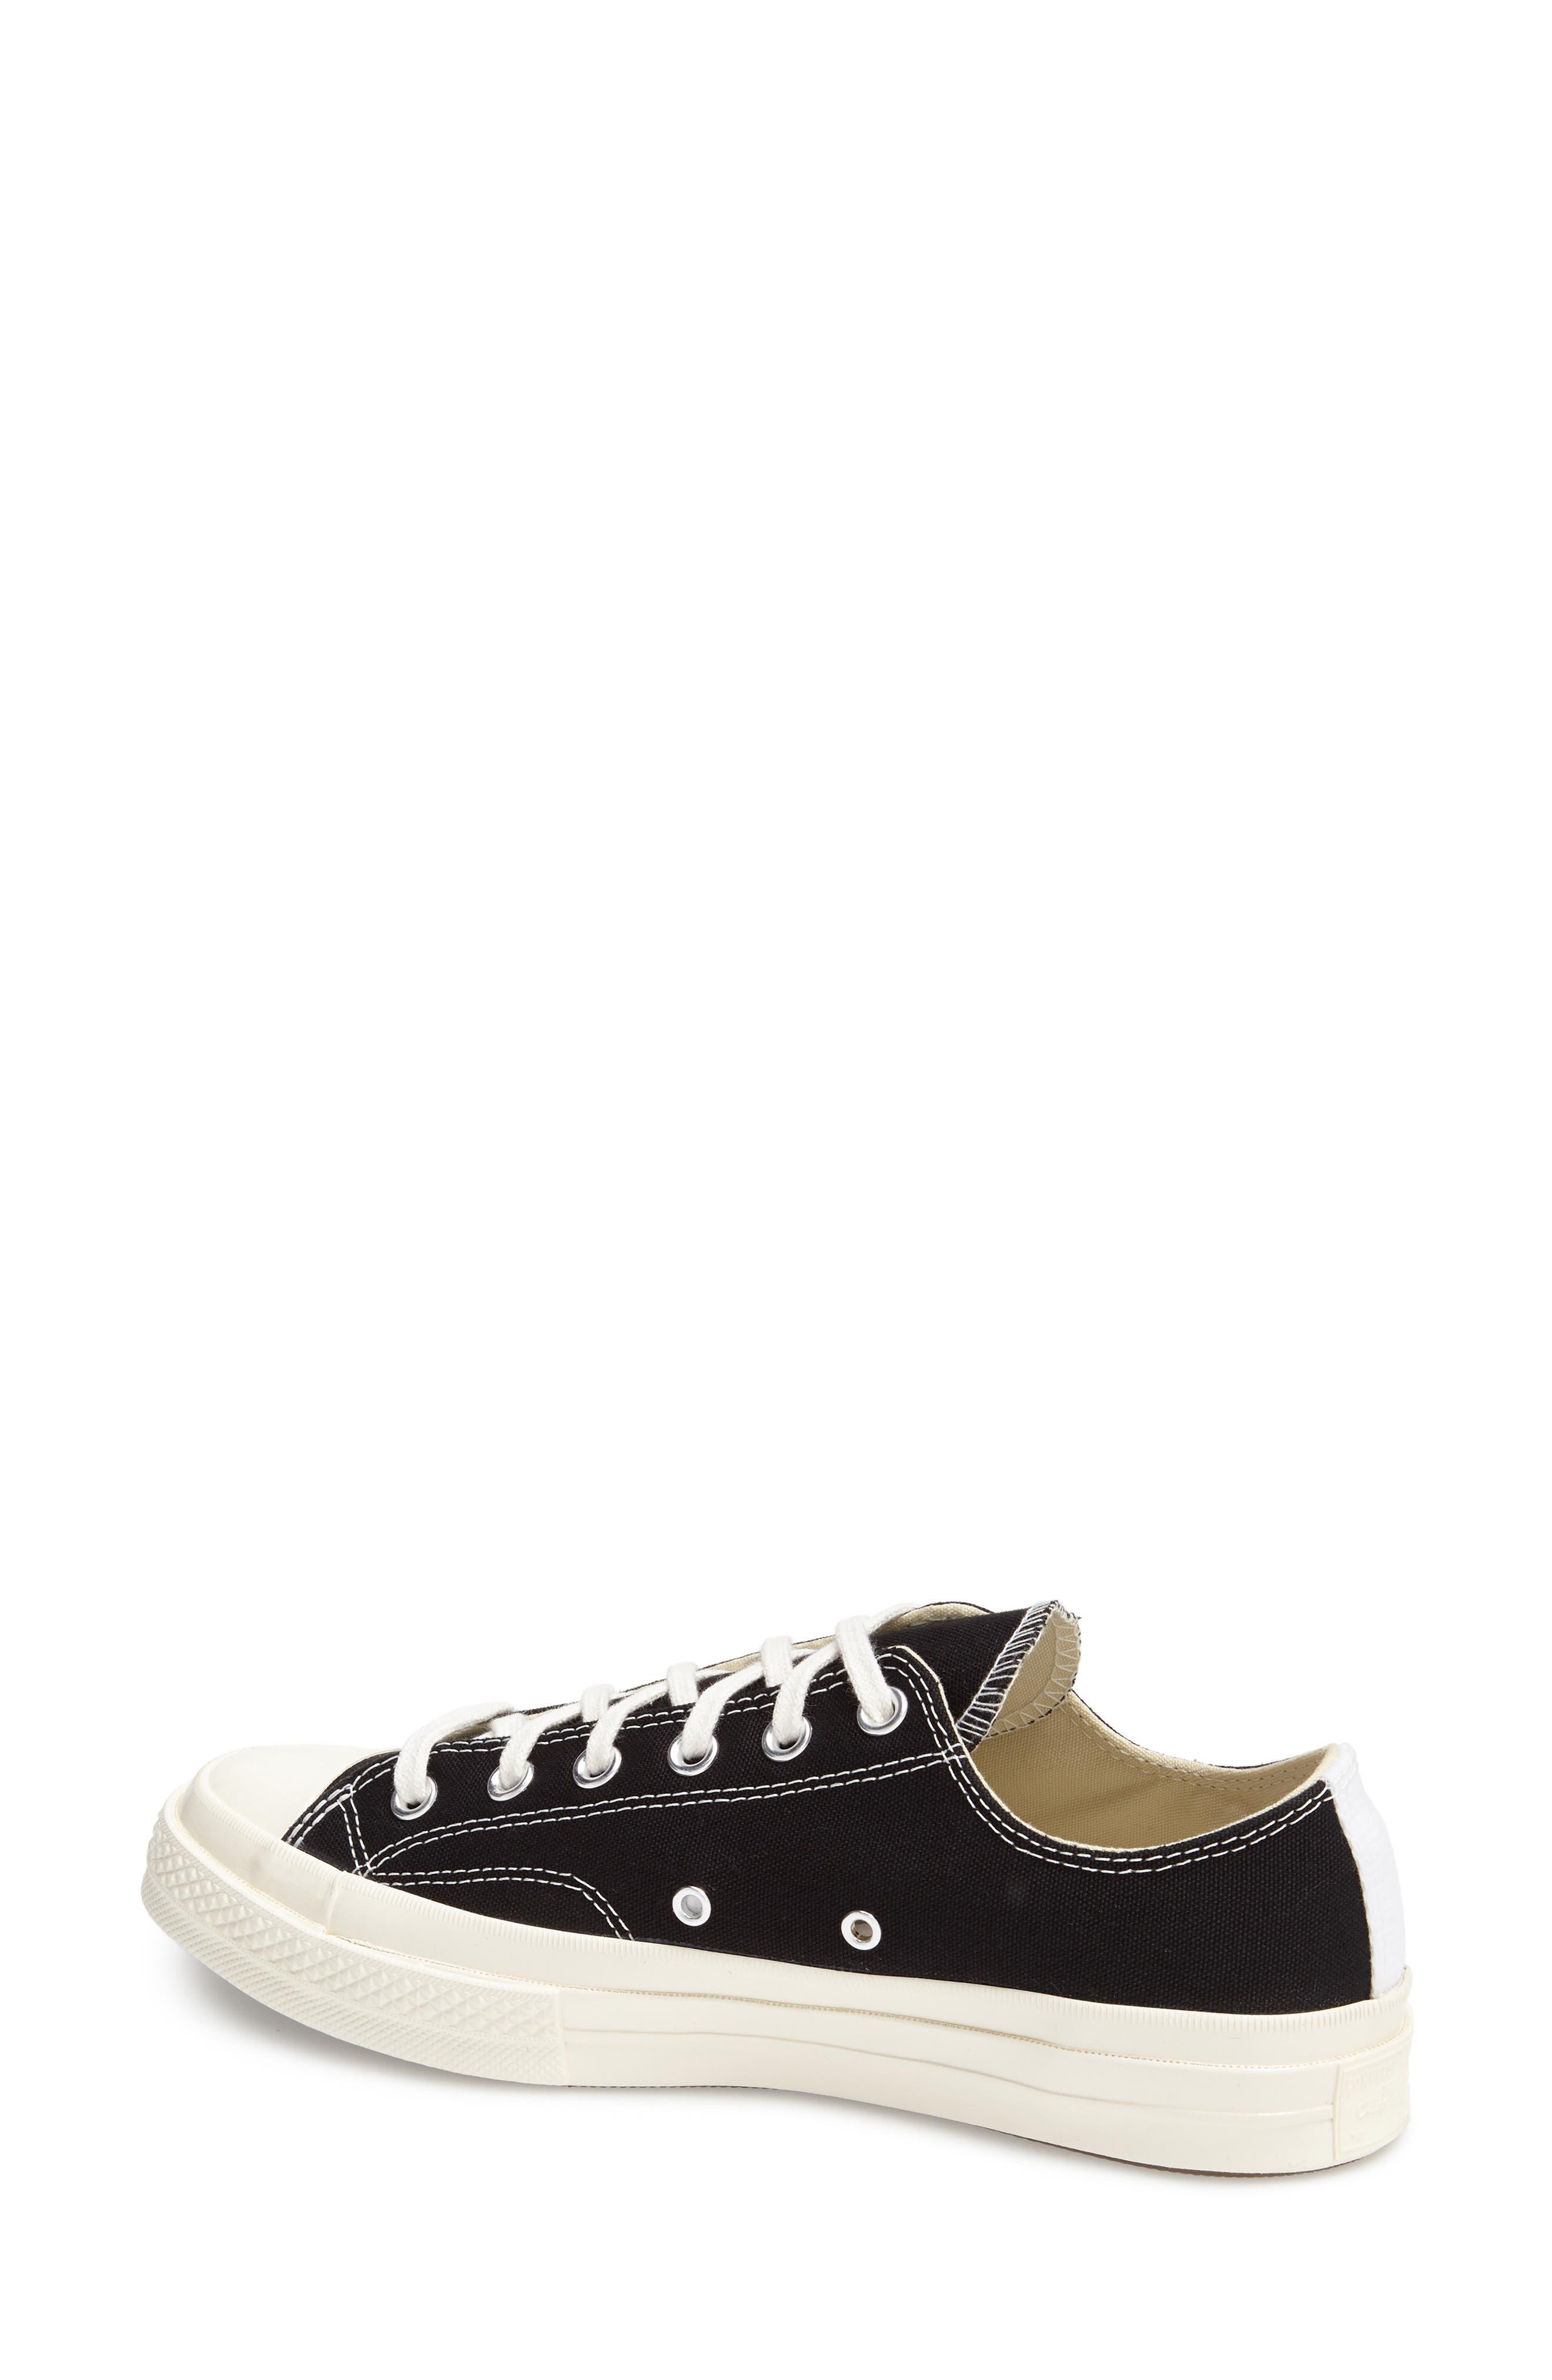 Comme des Garçons PLAY x Converse Chuck Taylor<sup>®</sup> Hidden Heart Low Top Sneaker,                             Main thumbnail 1, color,                             BLACK